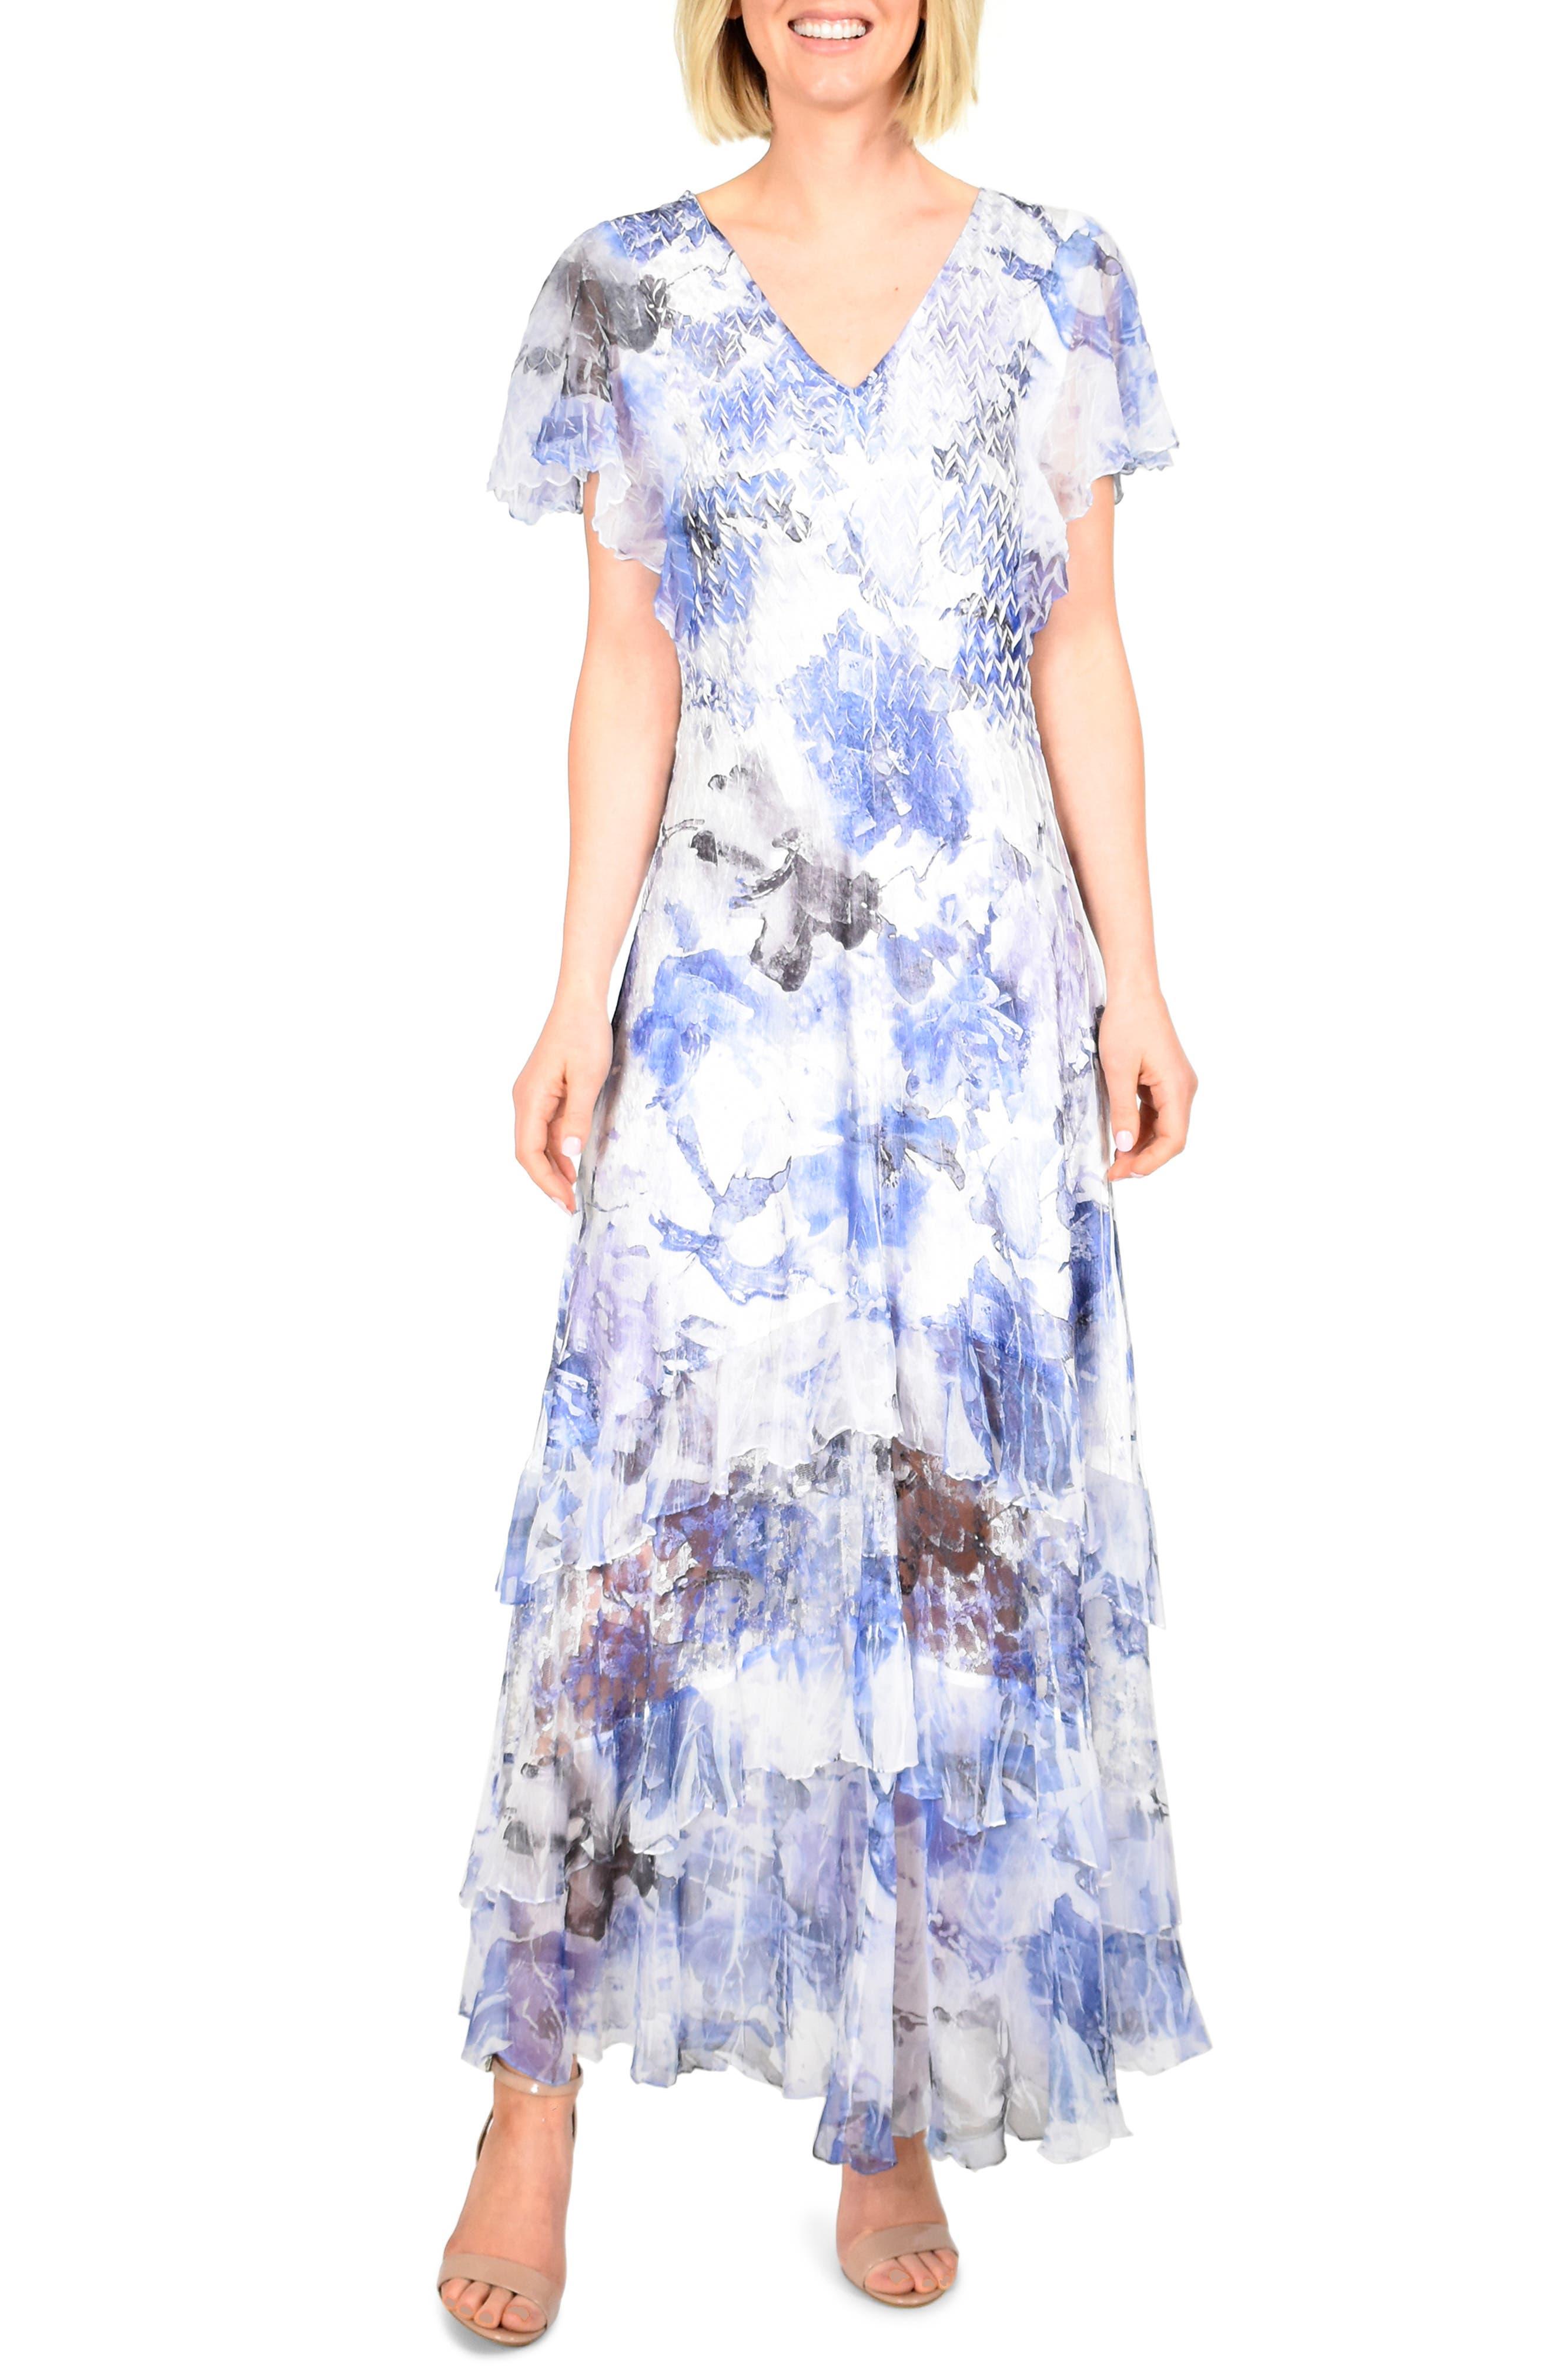 1930s Day Dresses, Afternoon Dresses History Womens Komarov Floral Charmeuse  Chiffon Maxi Dress $338.00 AT vintagedancer.com